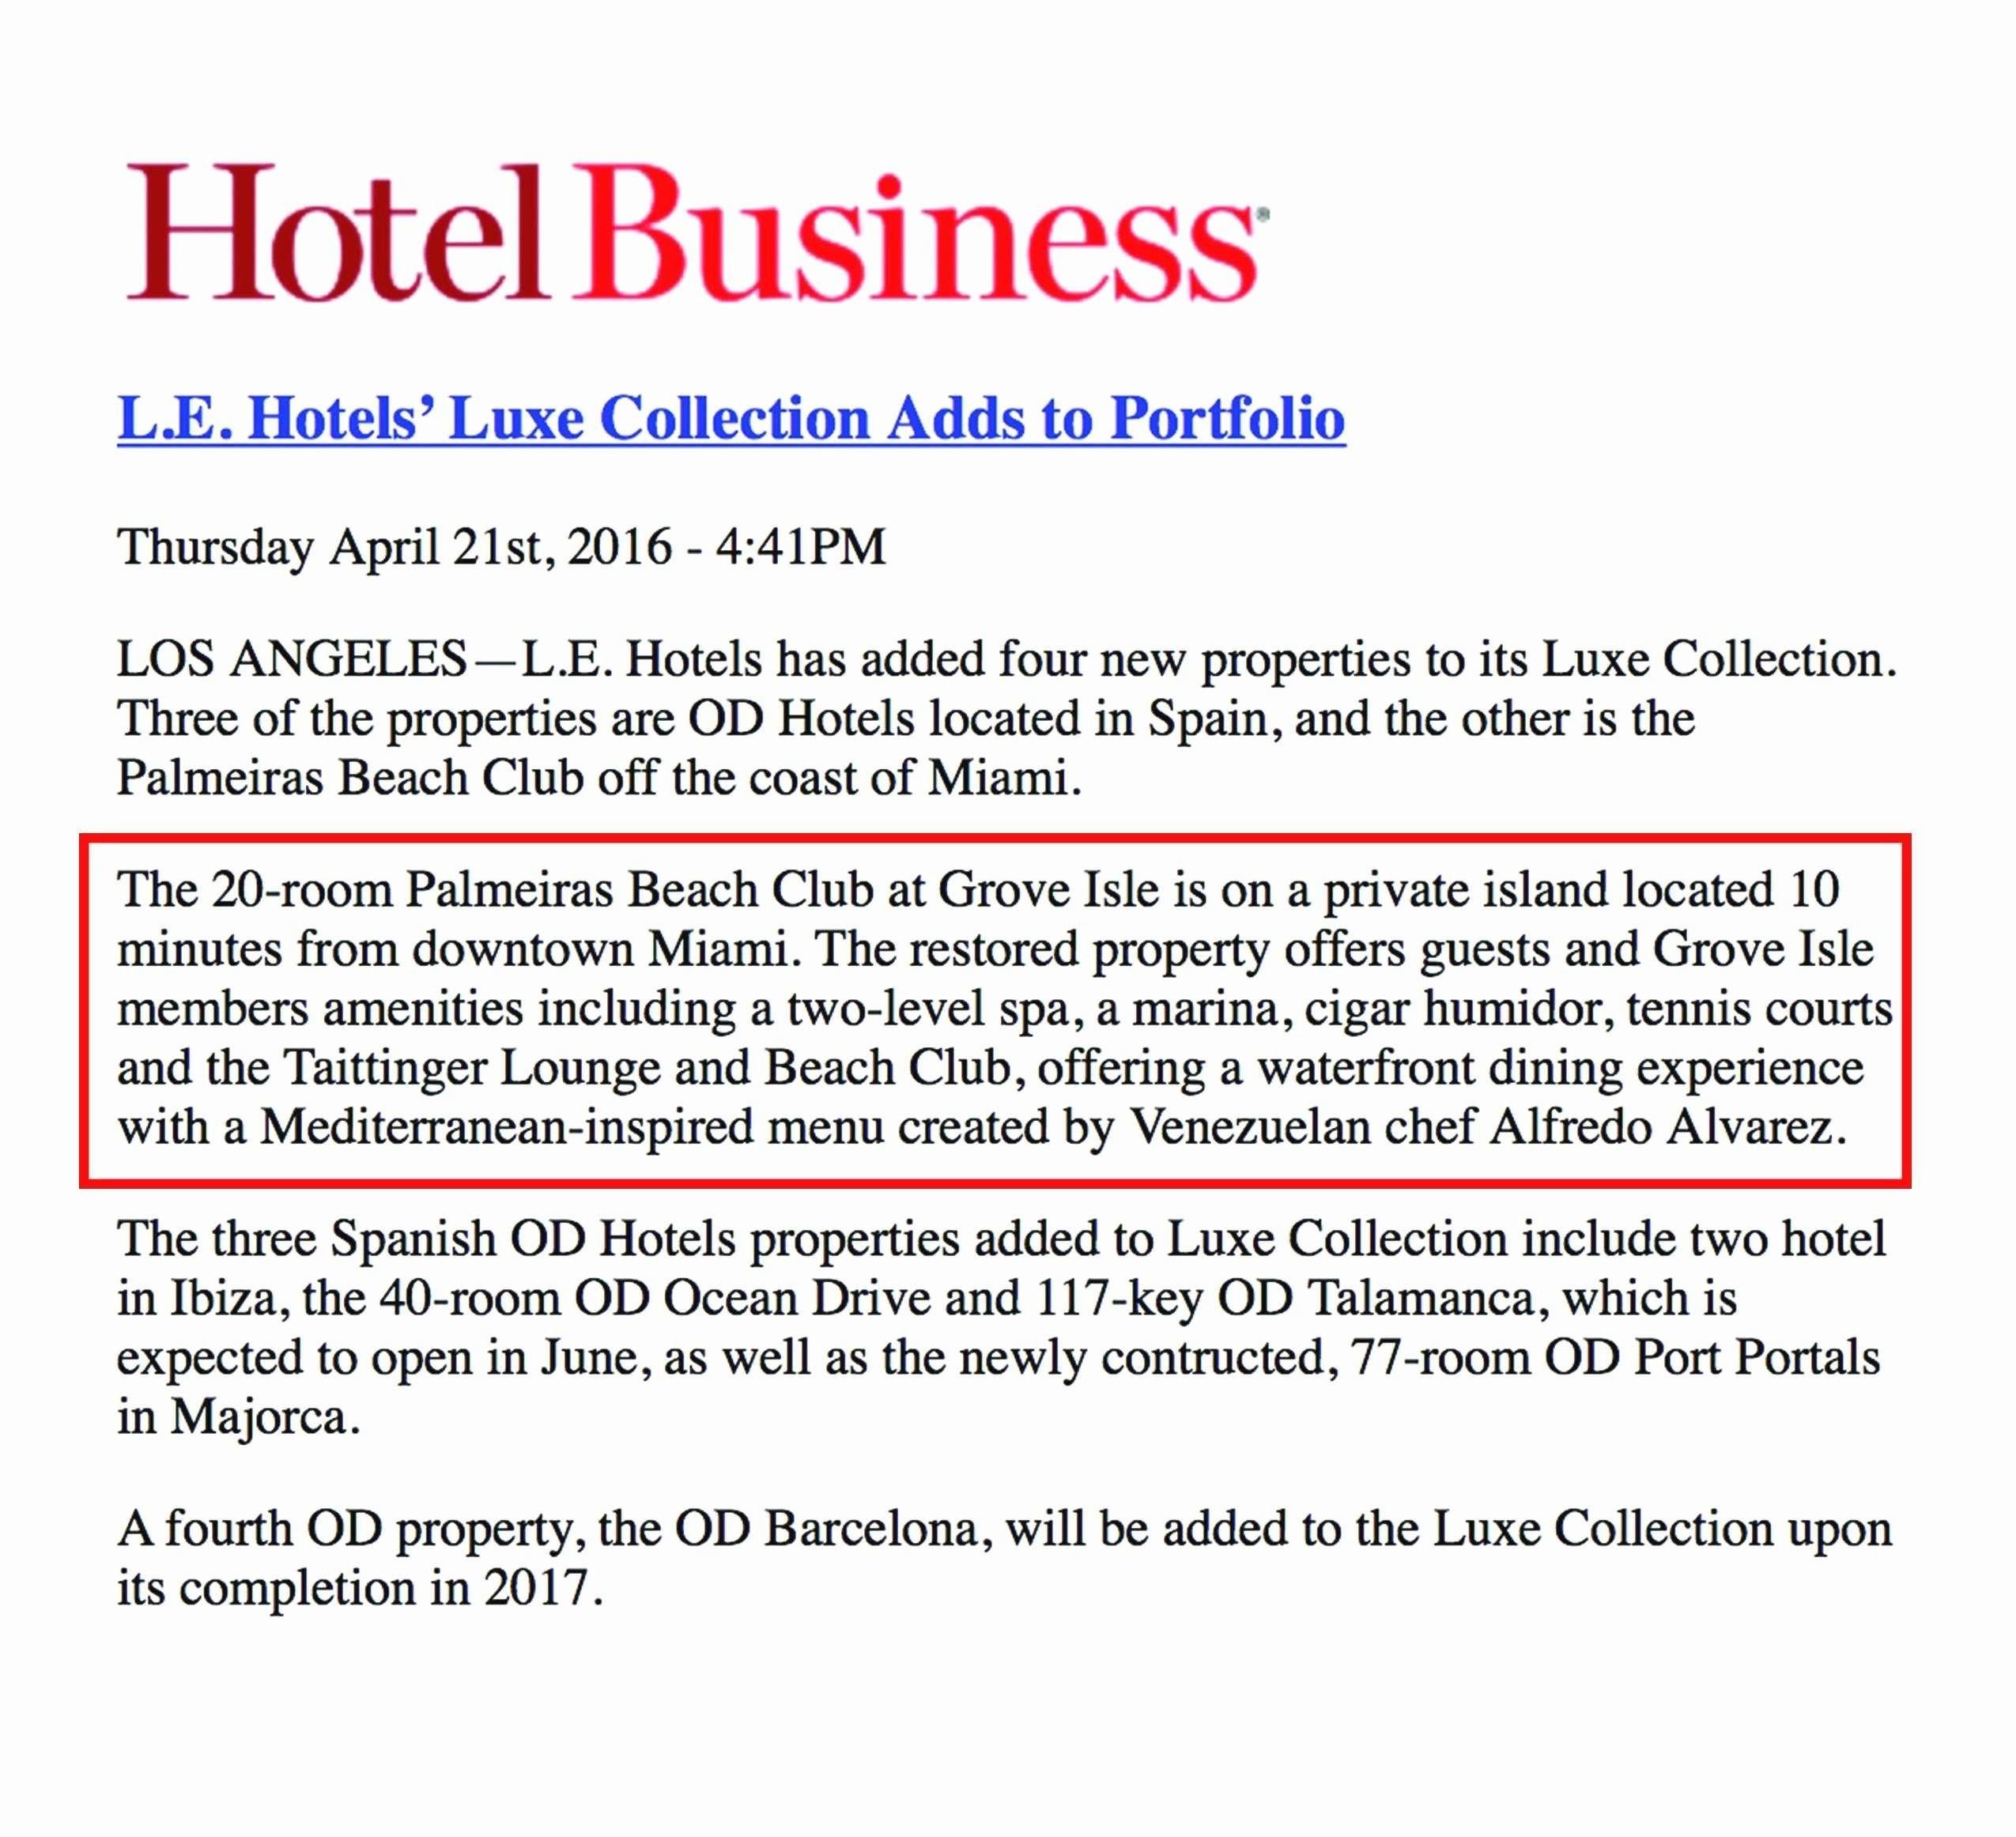 Calendario 2019 Chile Excel Más Reciente Promissory Note Template New York Elegant Promissory Note Template